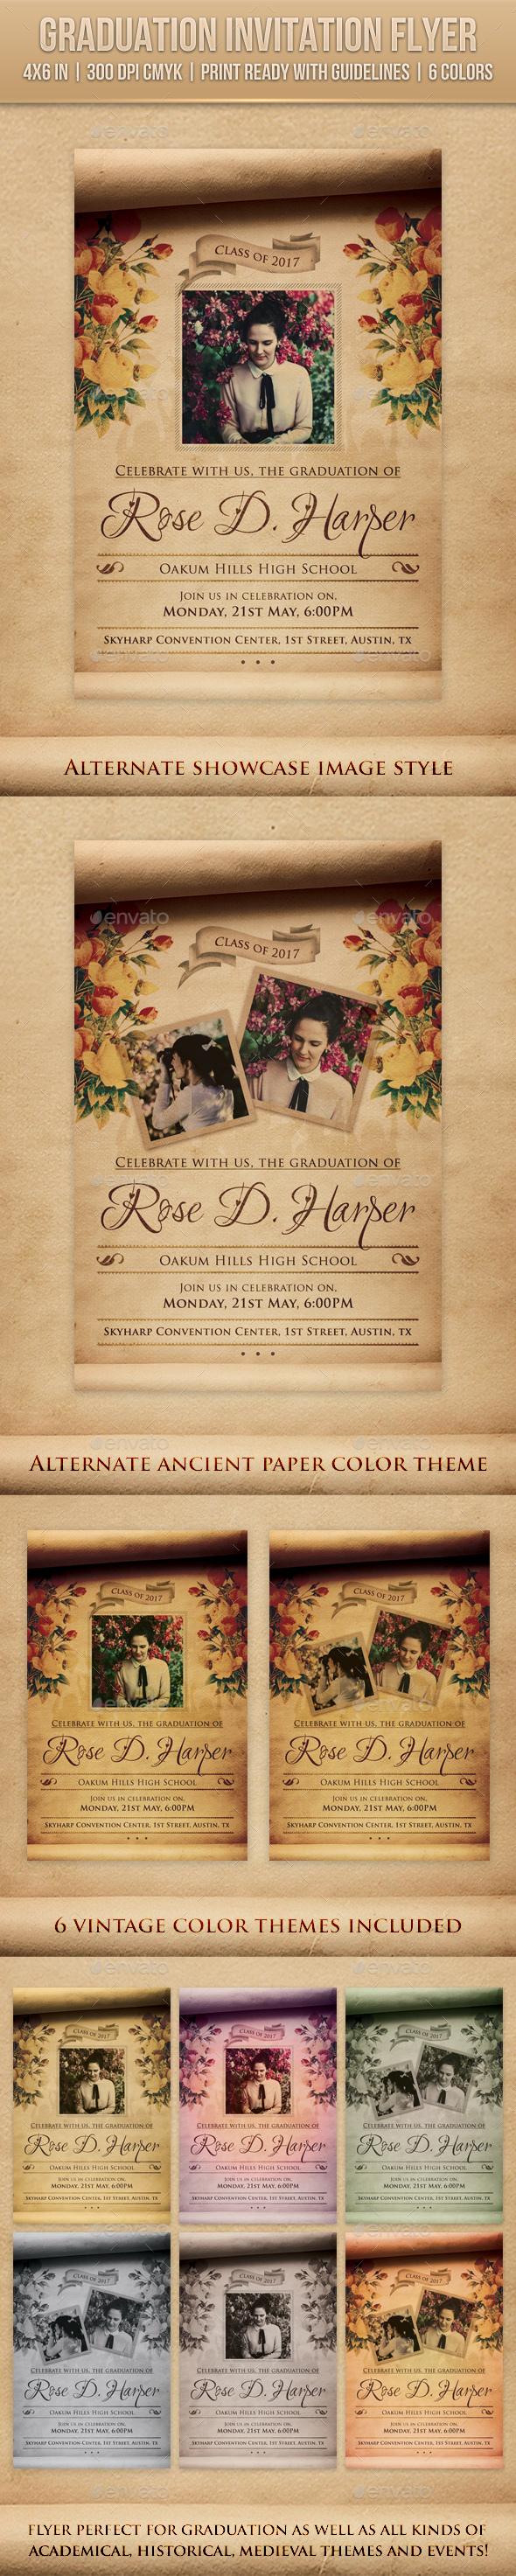 Graduation Invitation Flyer - Miscellaneous Events